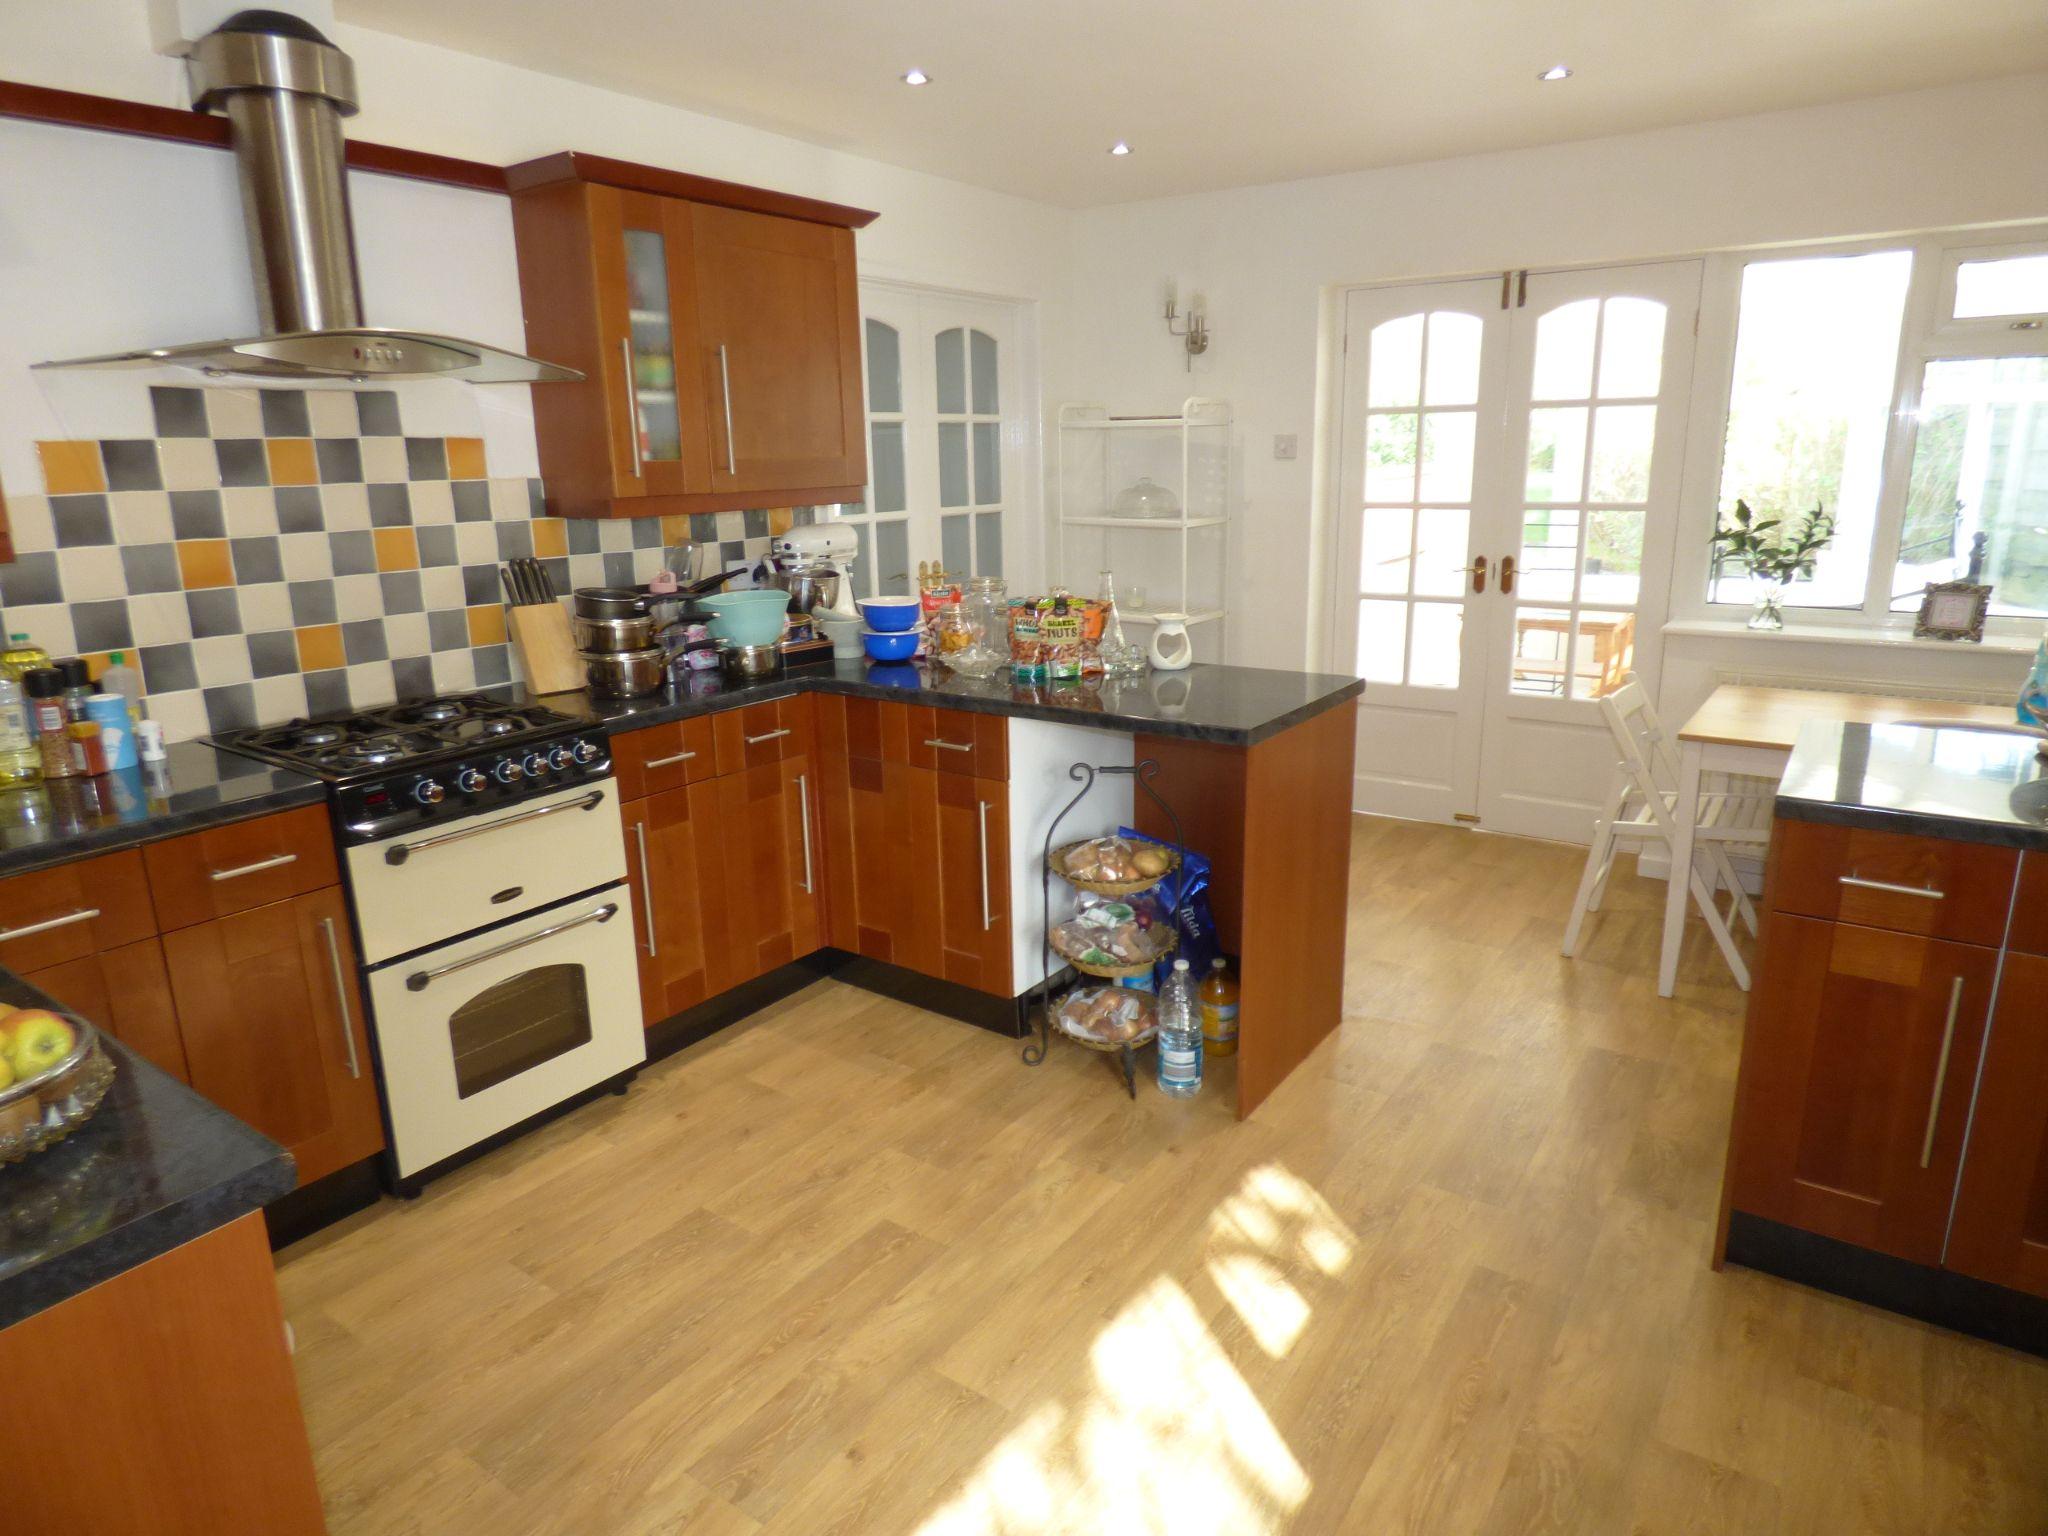 4 Bedroom Detached House For Sale - Kitchen